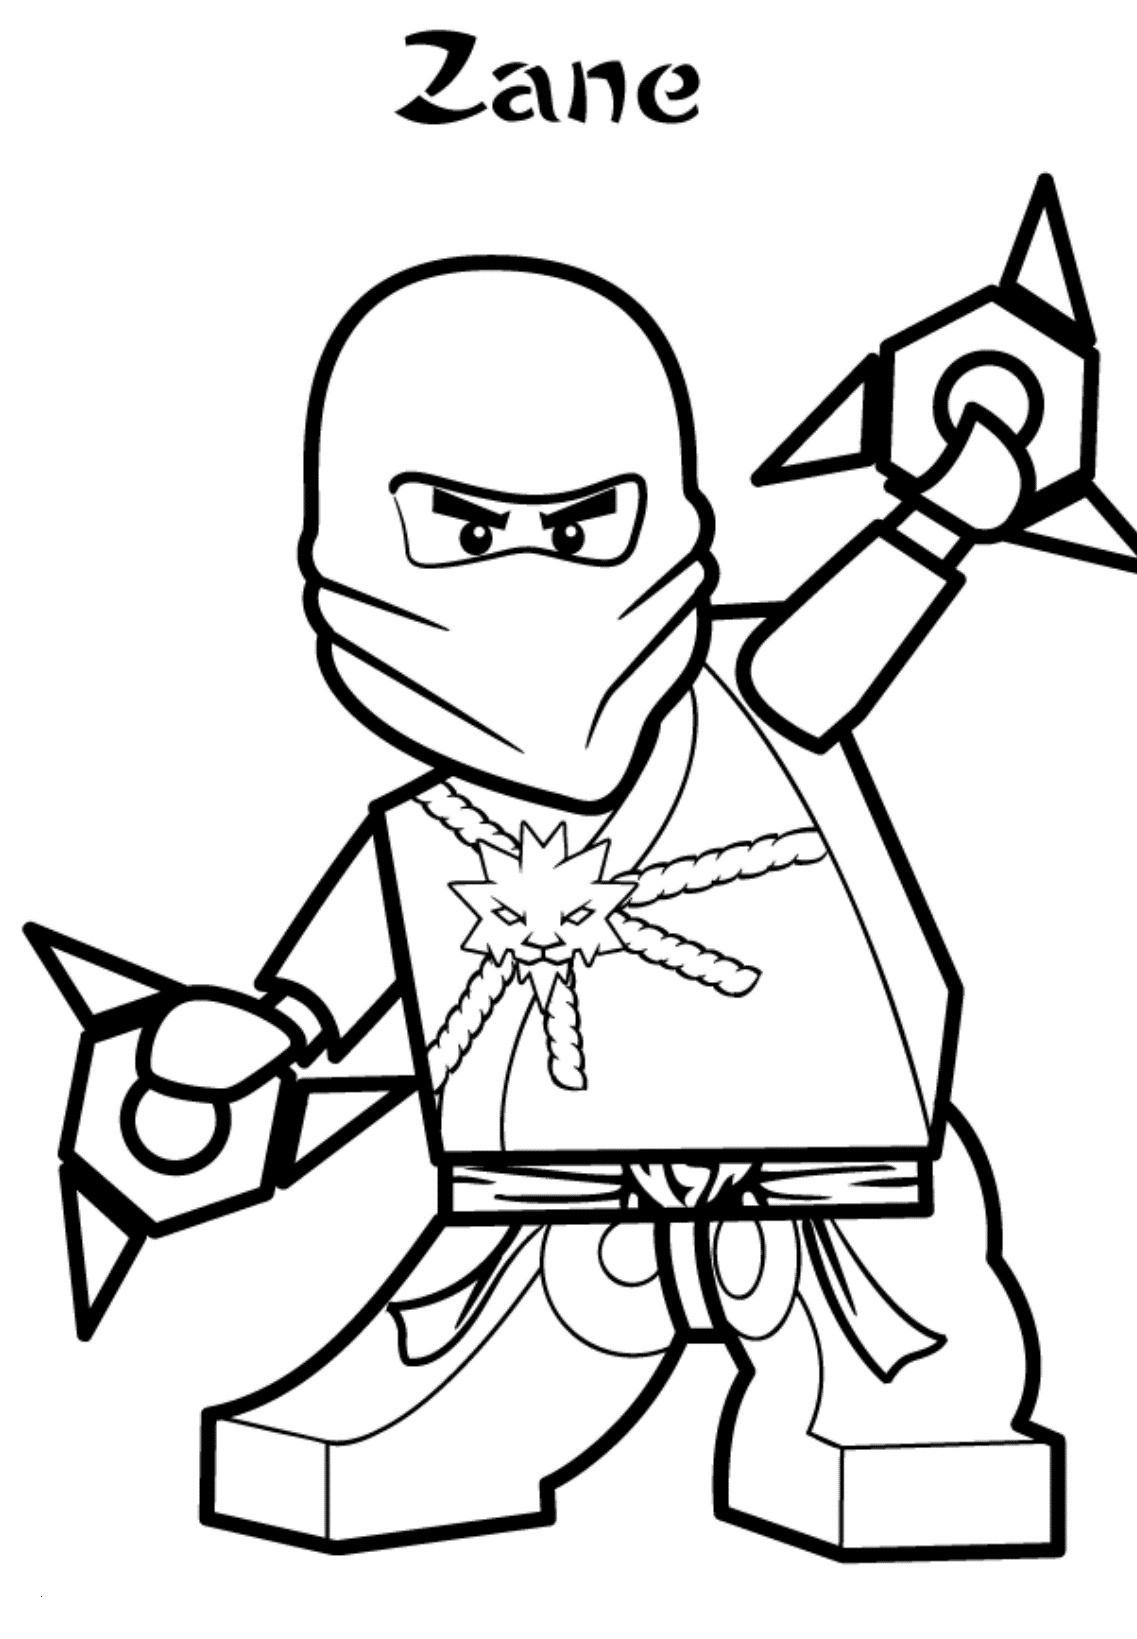 Ausmalbild Ninjago Drache Genial 40 Ninjago Ausmalbilder Nya forstergallery Das Bild